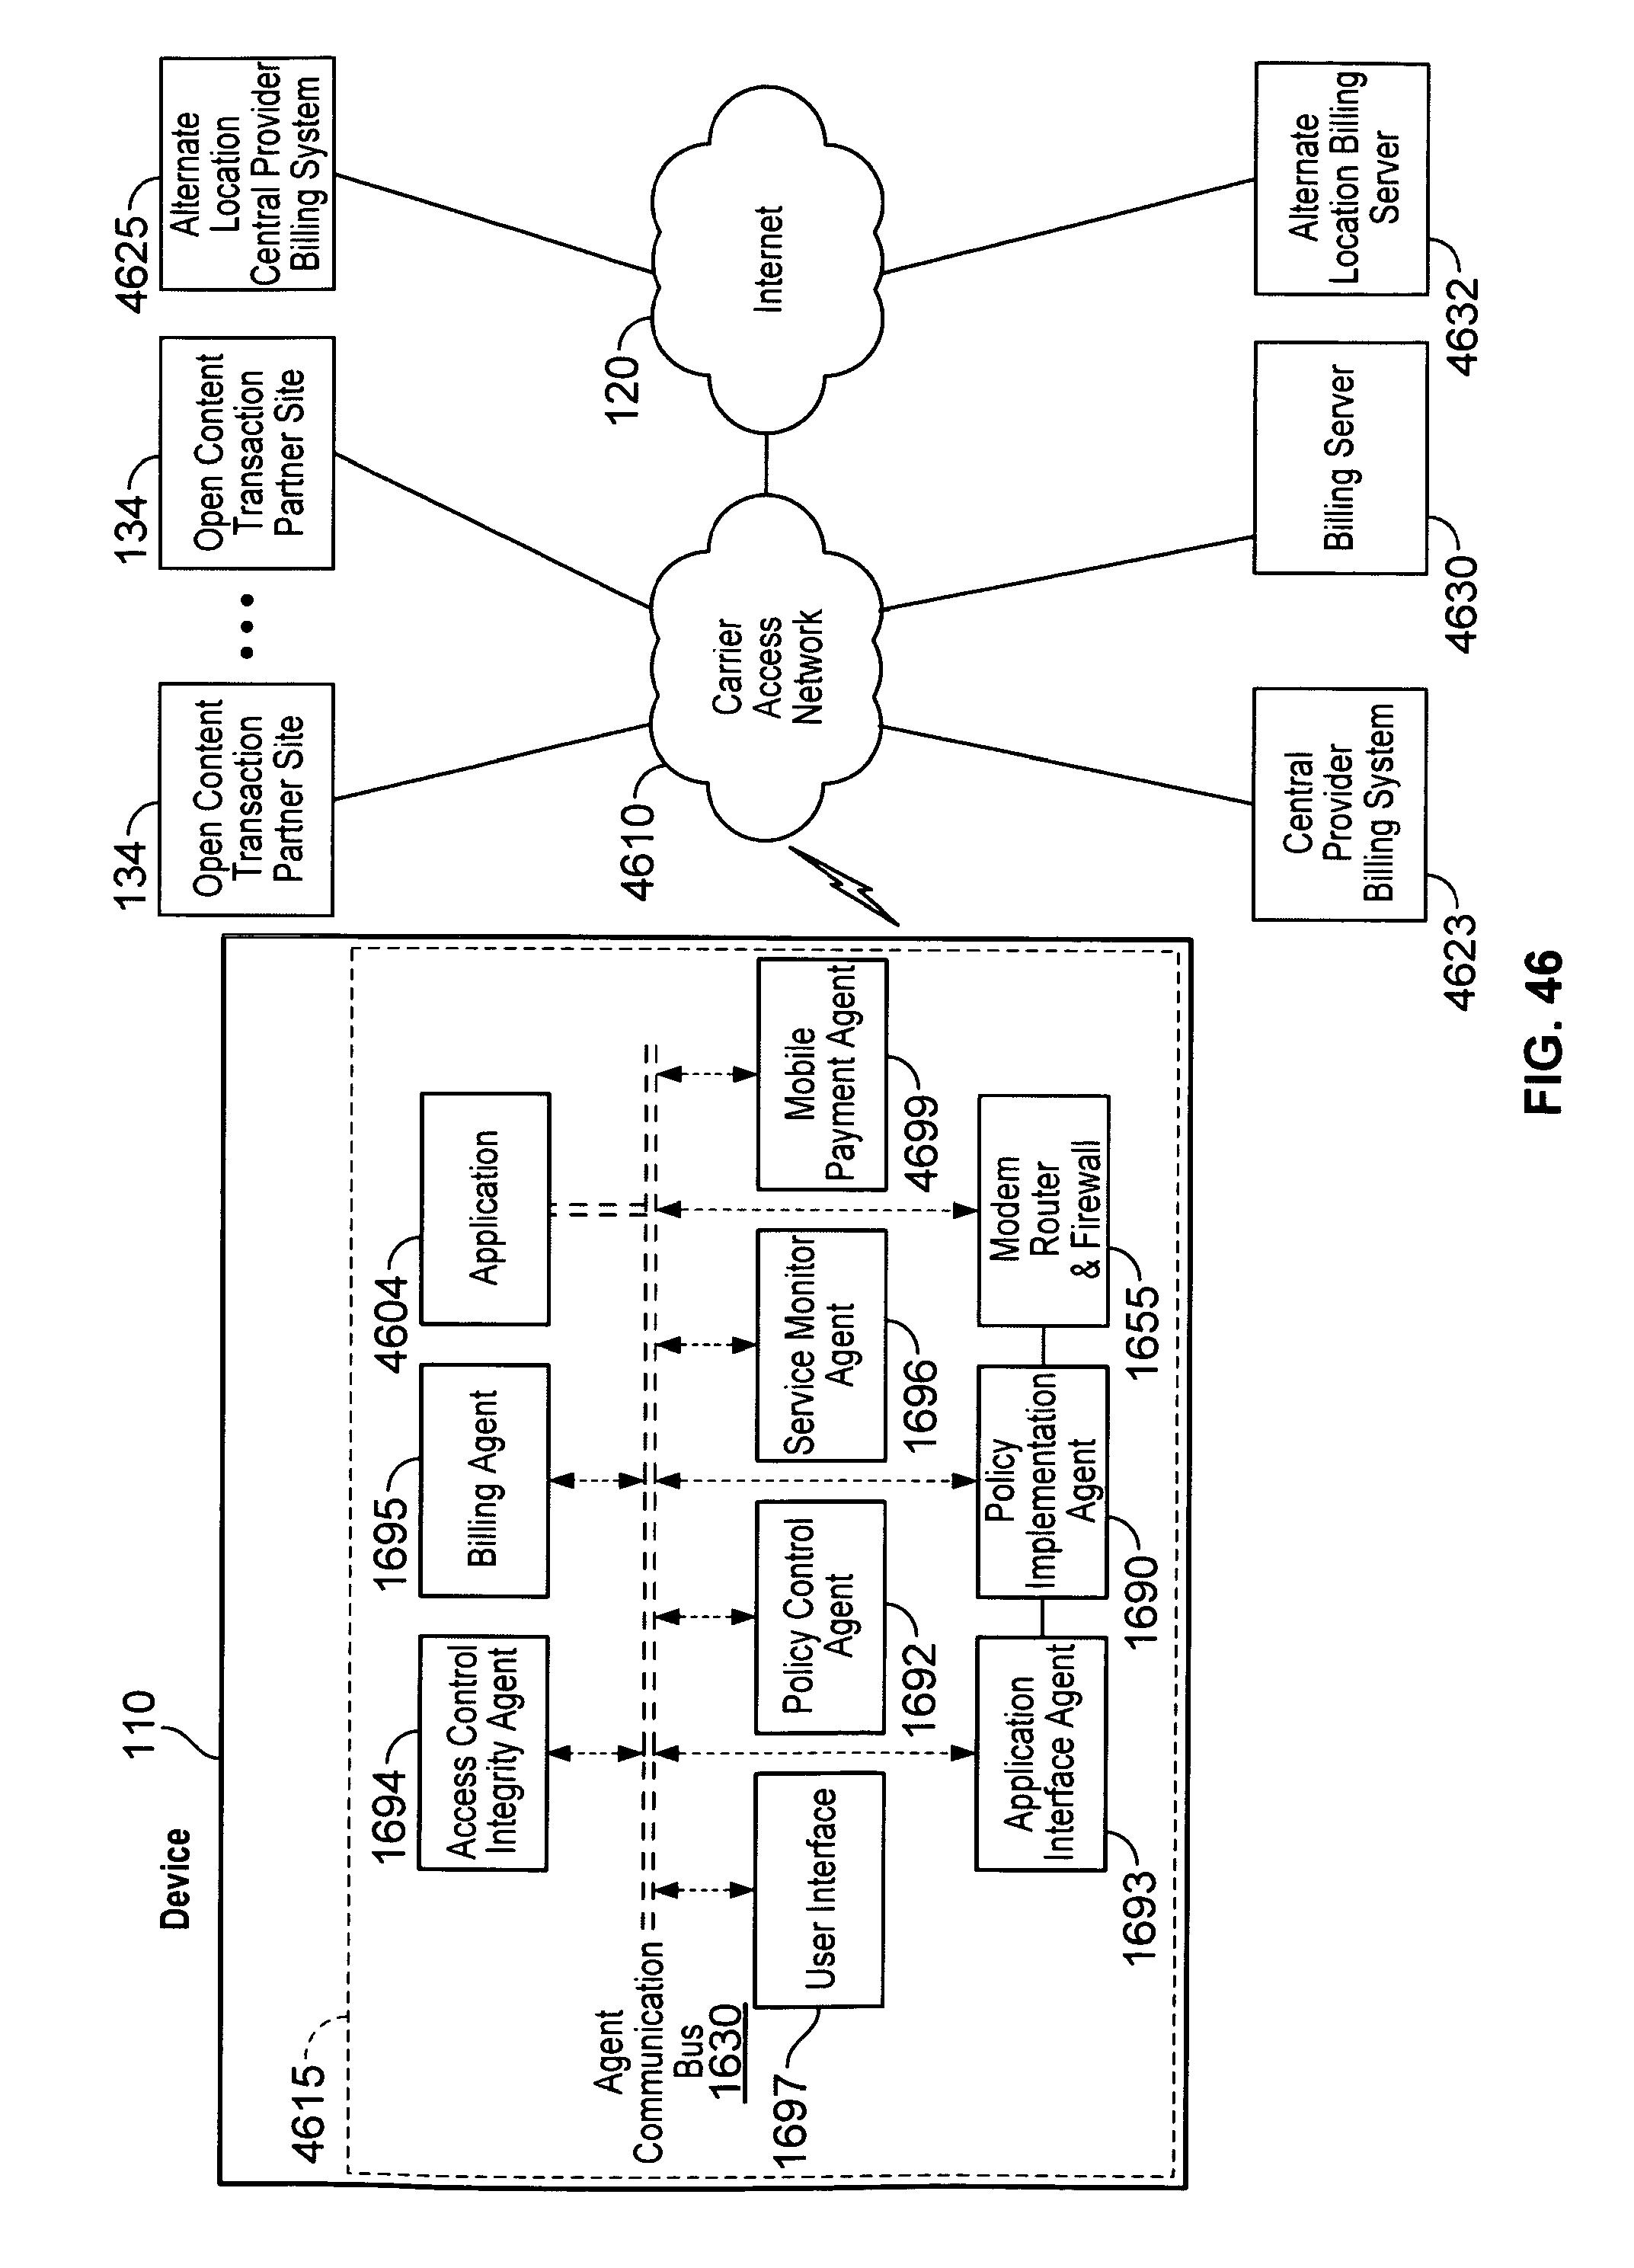 Patent Us 8547872 B2 134 F Head Engine Diagram 0 Petitions